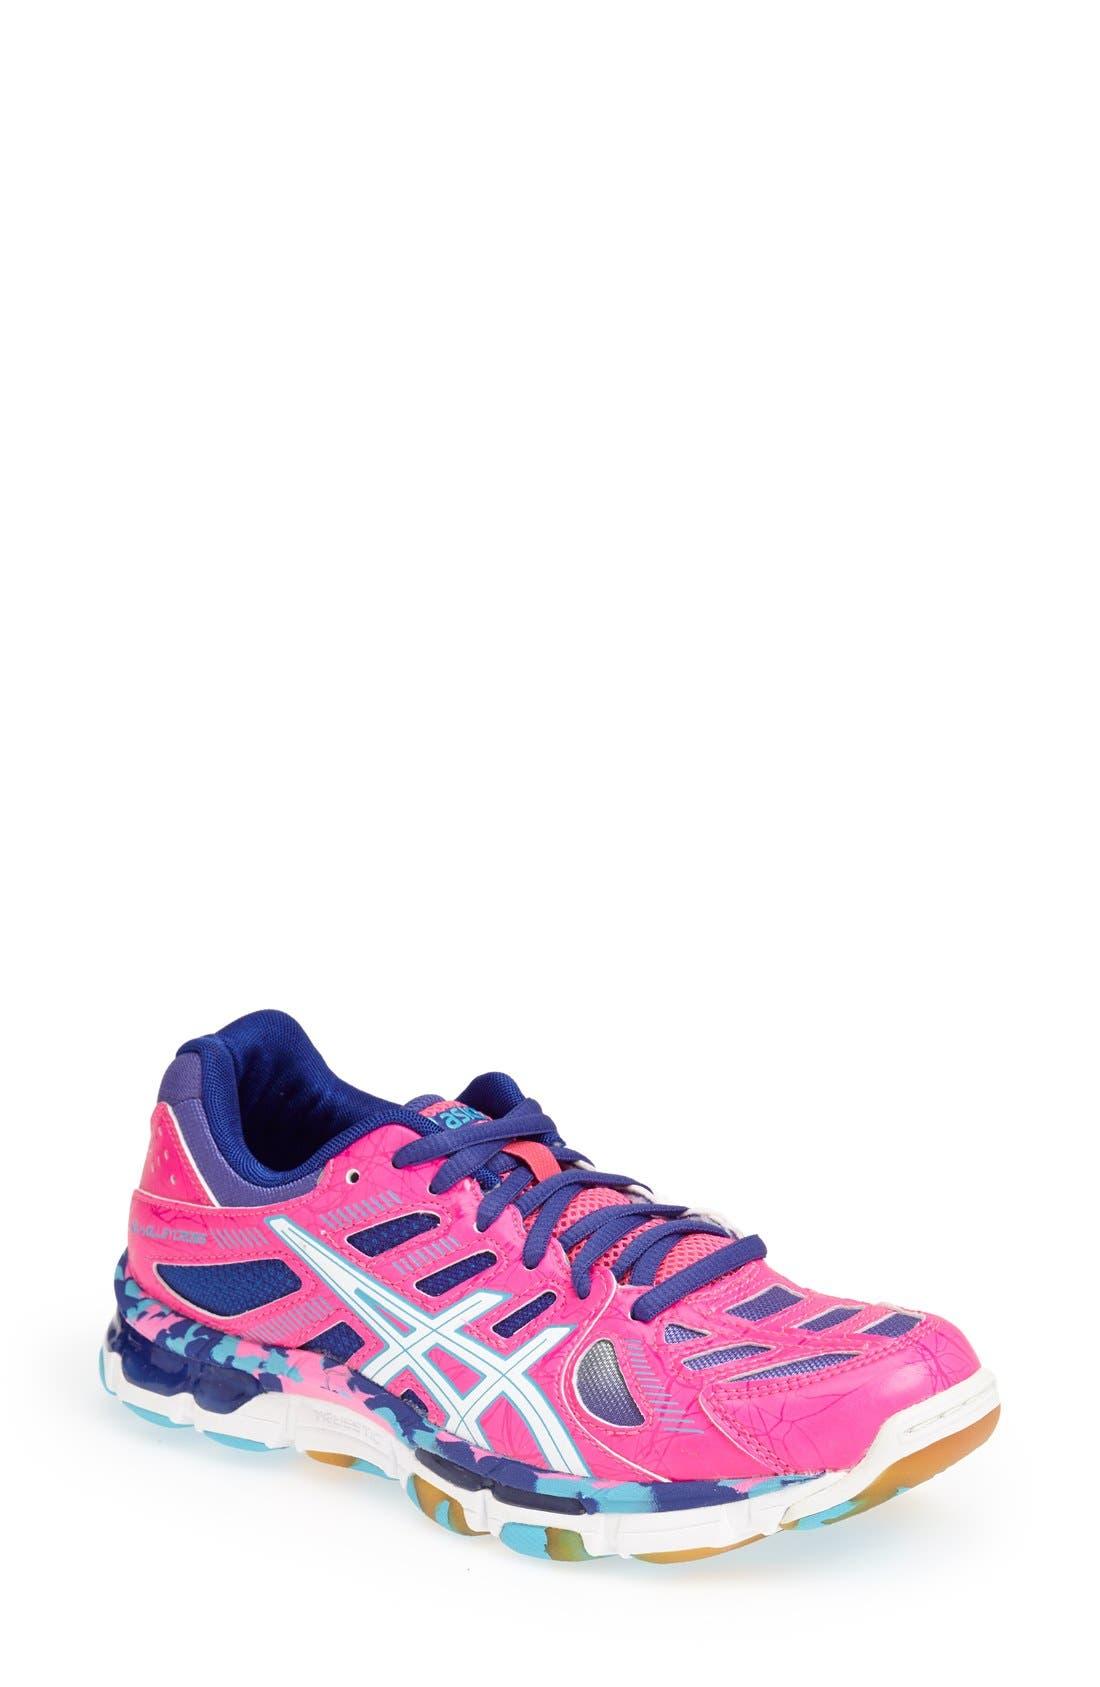 Main Image - ASICS® 'GEL-Volleycross® Revolution' Volleyball Shoe (Women) (Regular Retail Price: 109.95)